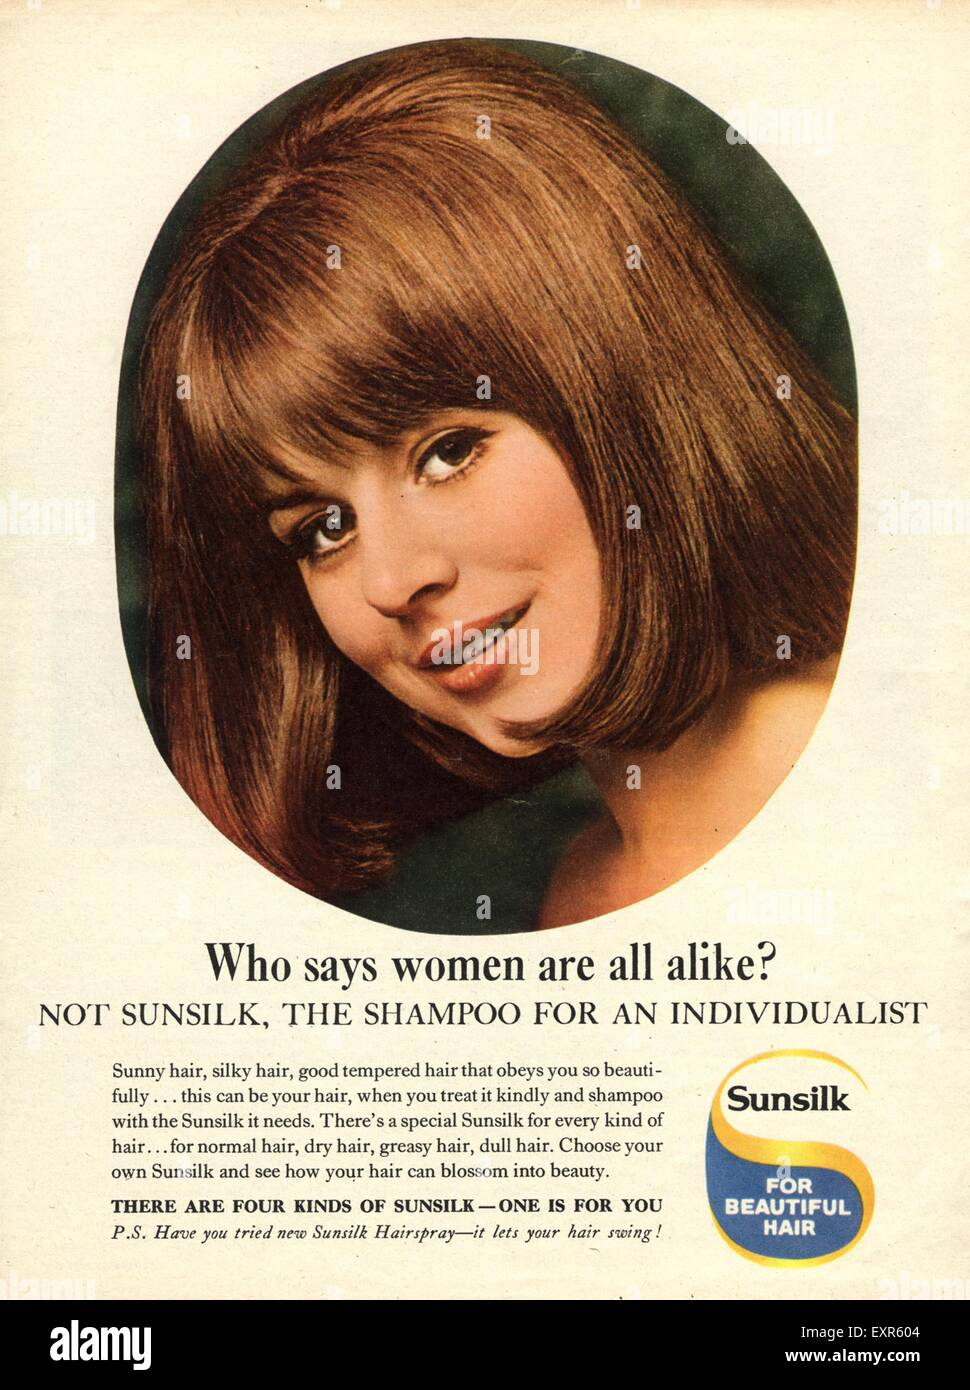 Sunsilk Shampoo Stock Photos & Sunsilk Shampoo Stock Images